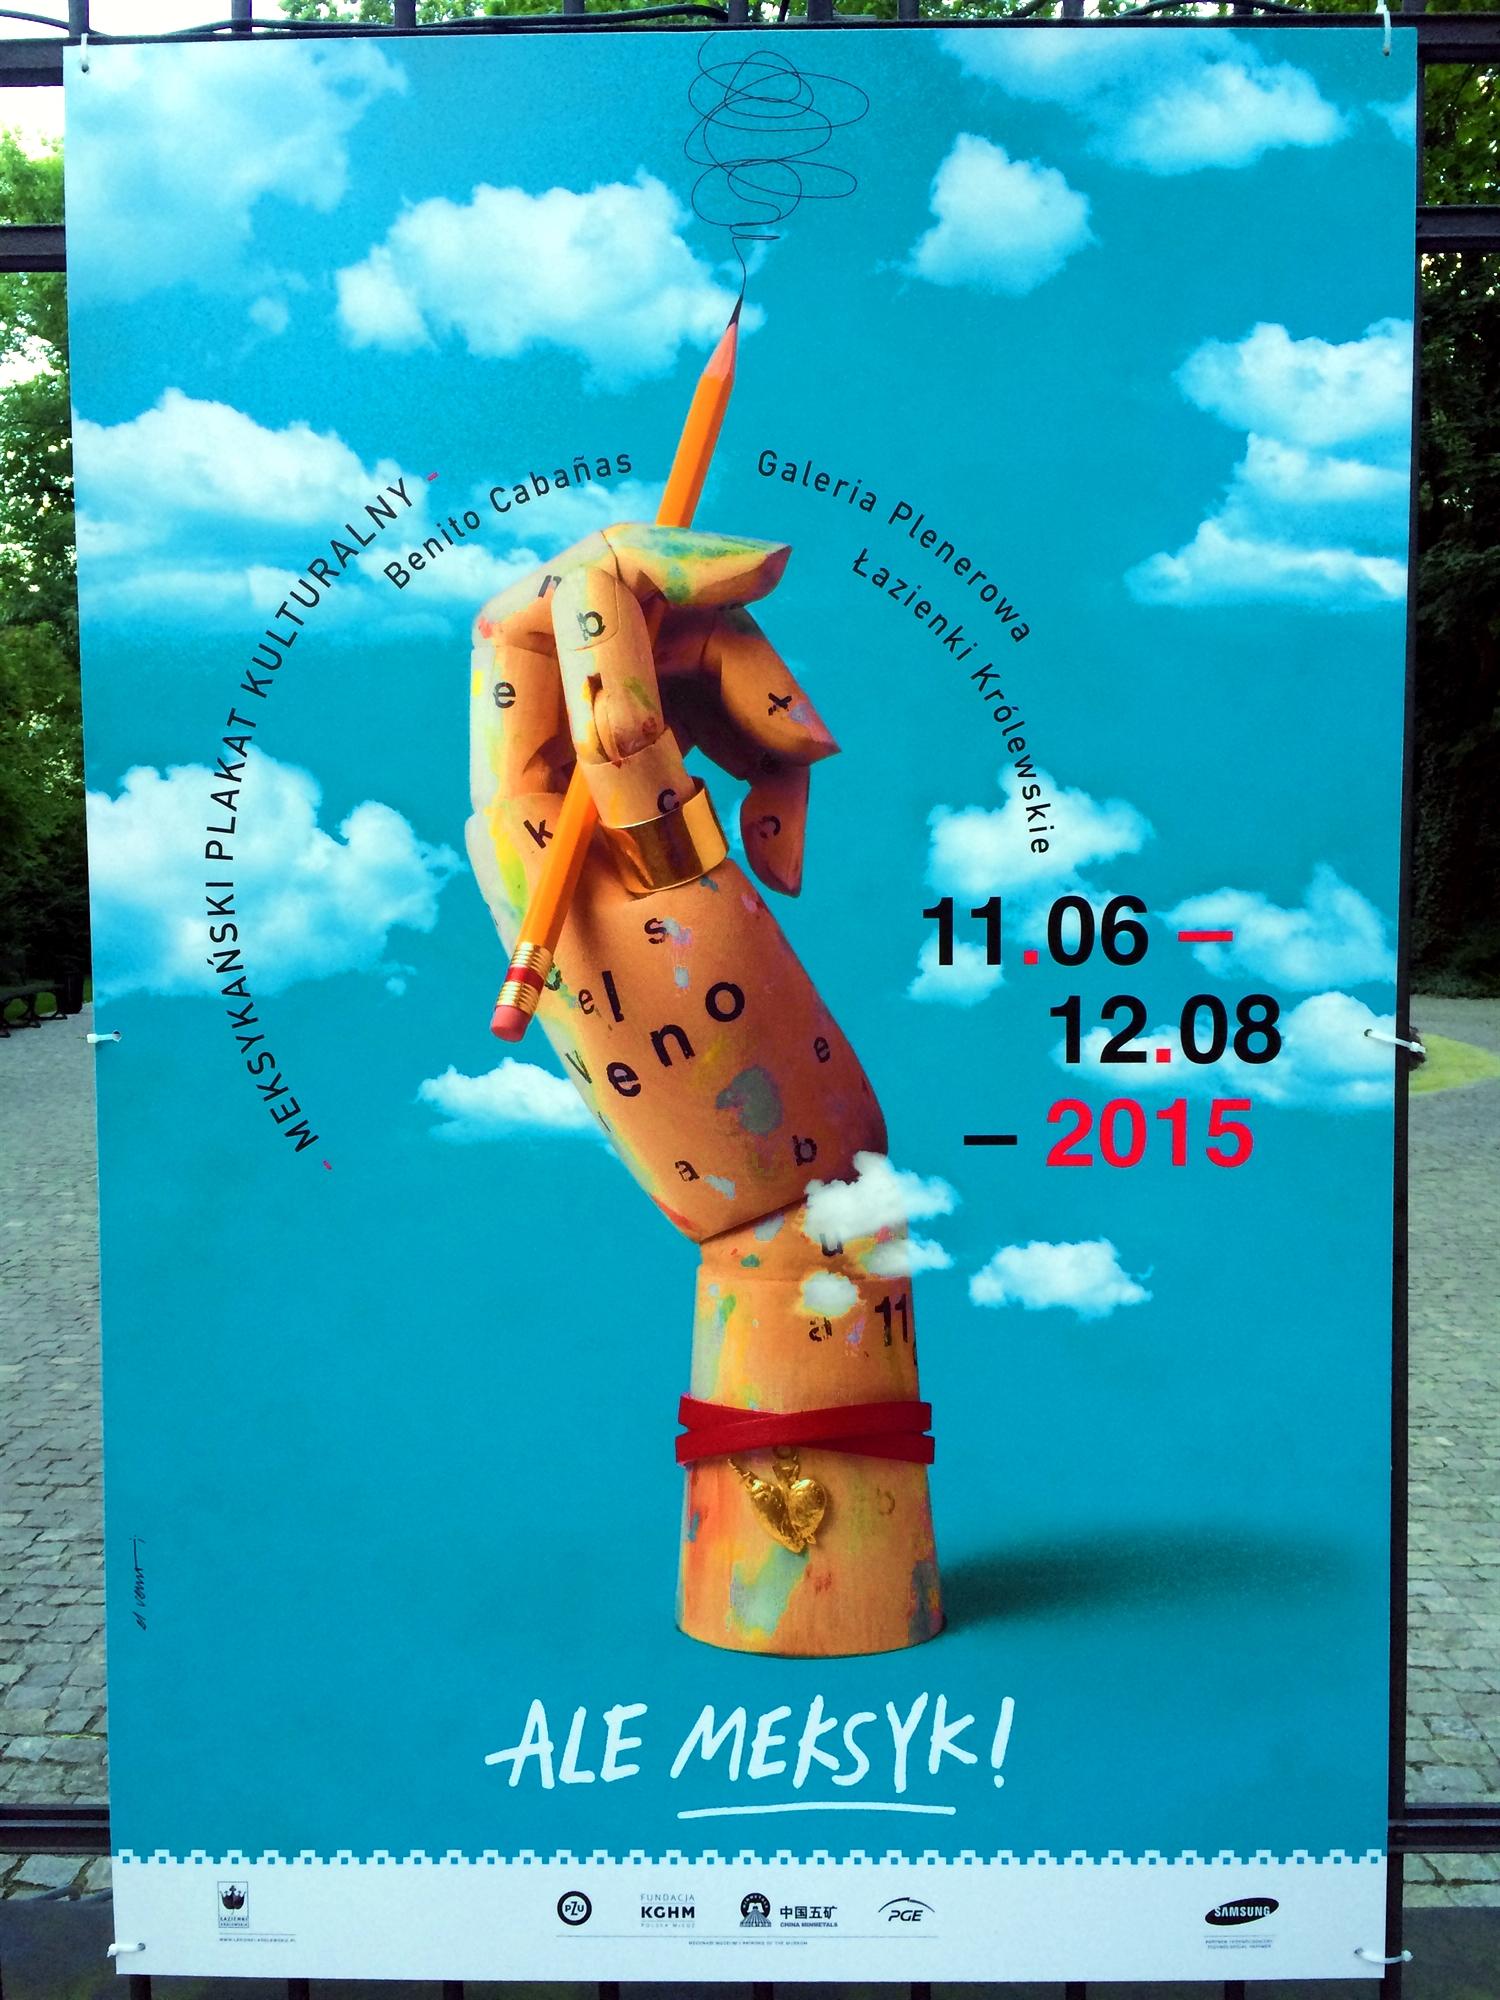 5 Mexican poster street art design plakat meksykanski projektowanie uzytkowe sztuka uliczna FORelementspl